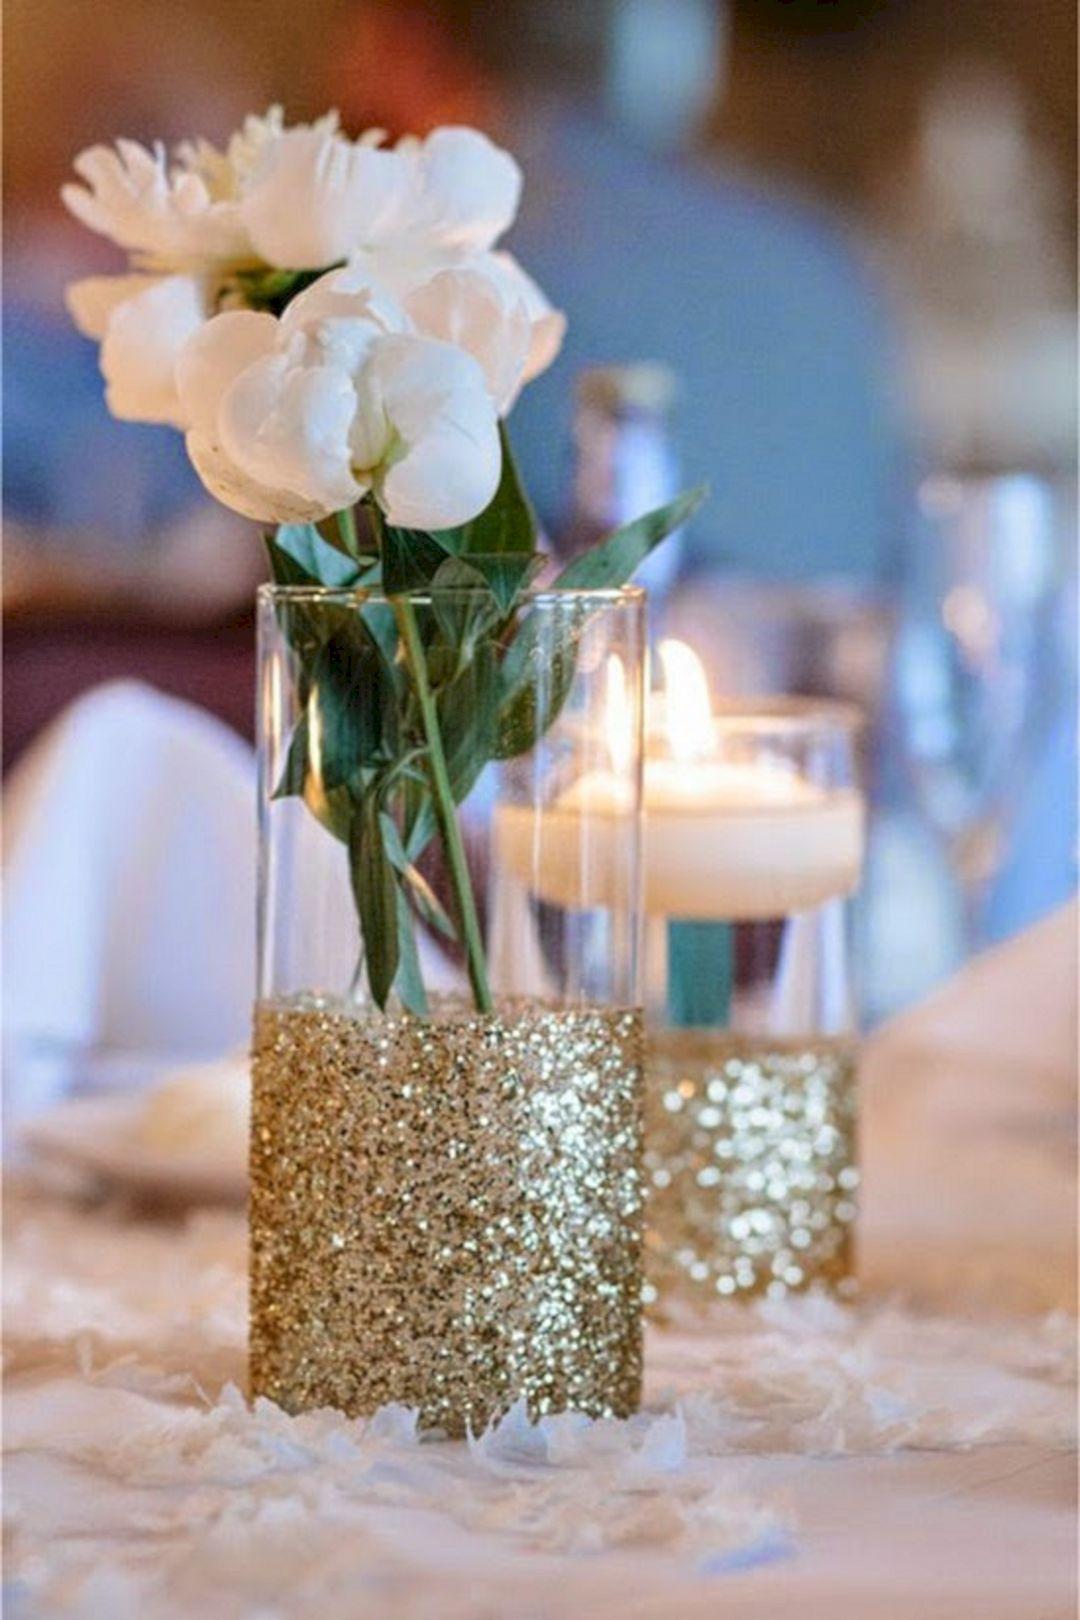 Diy Wedding Centerpieces Ideas 34 Simple Wedding Centerpieces Wedding Floral Centerpieces Diy Wedding Decorations